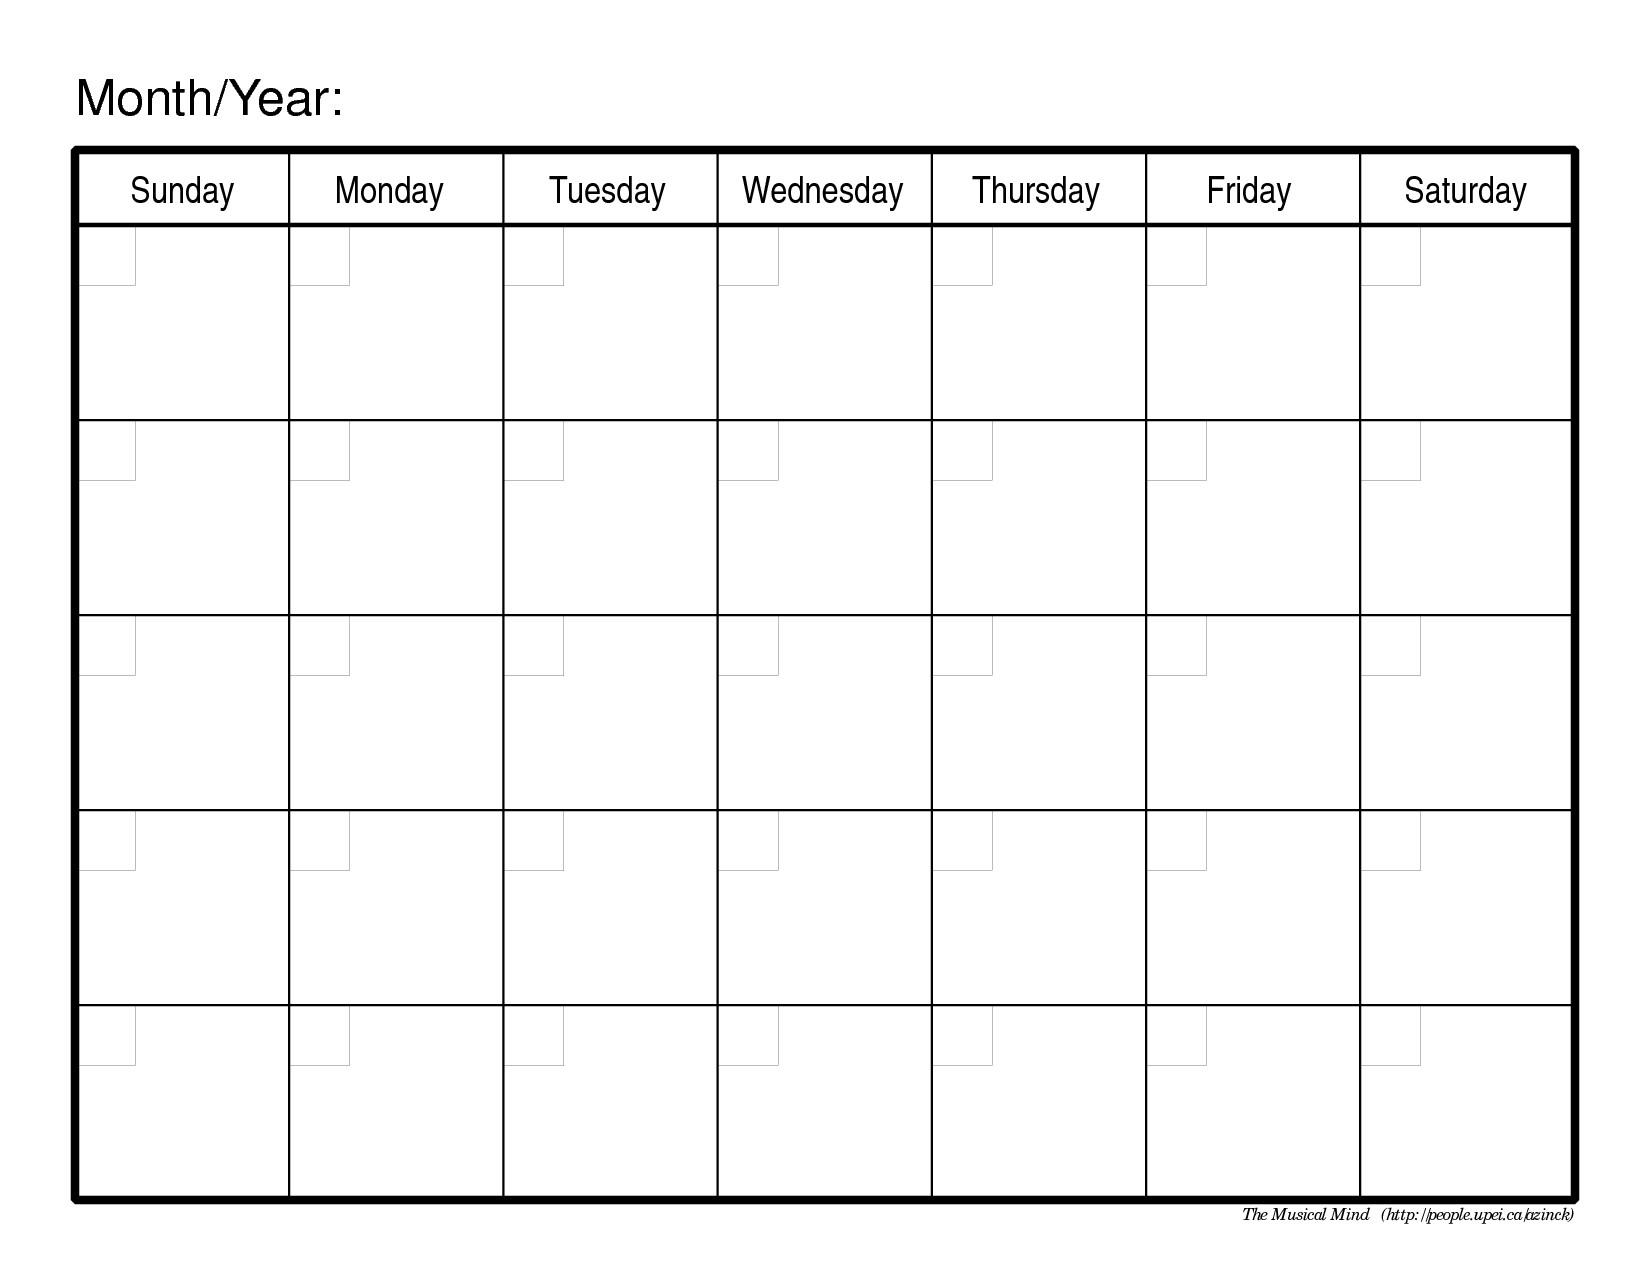 Print Blank Calendar From Ipad Printable For Absolutely Free_Calendar Blank On Ipad